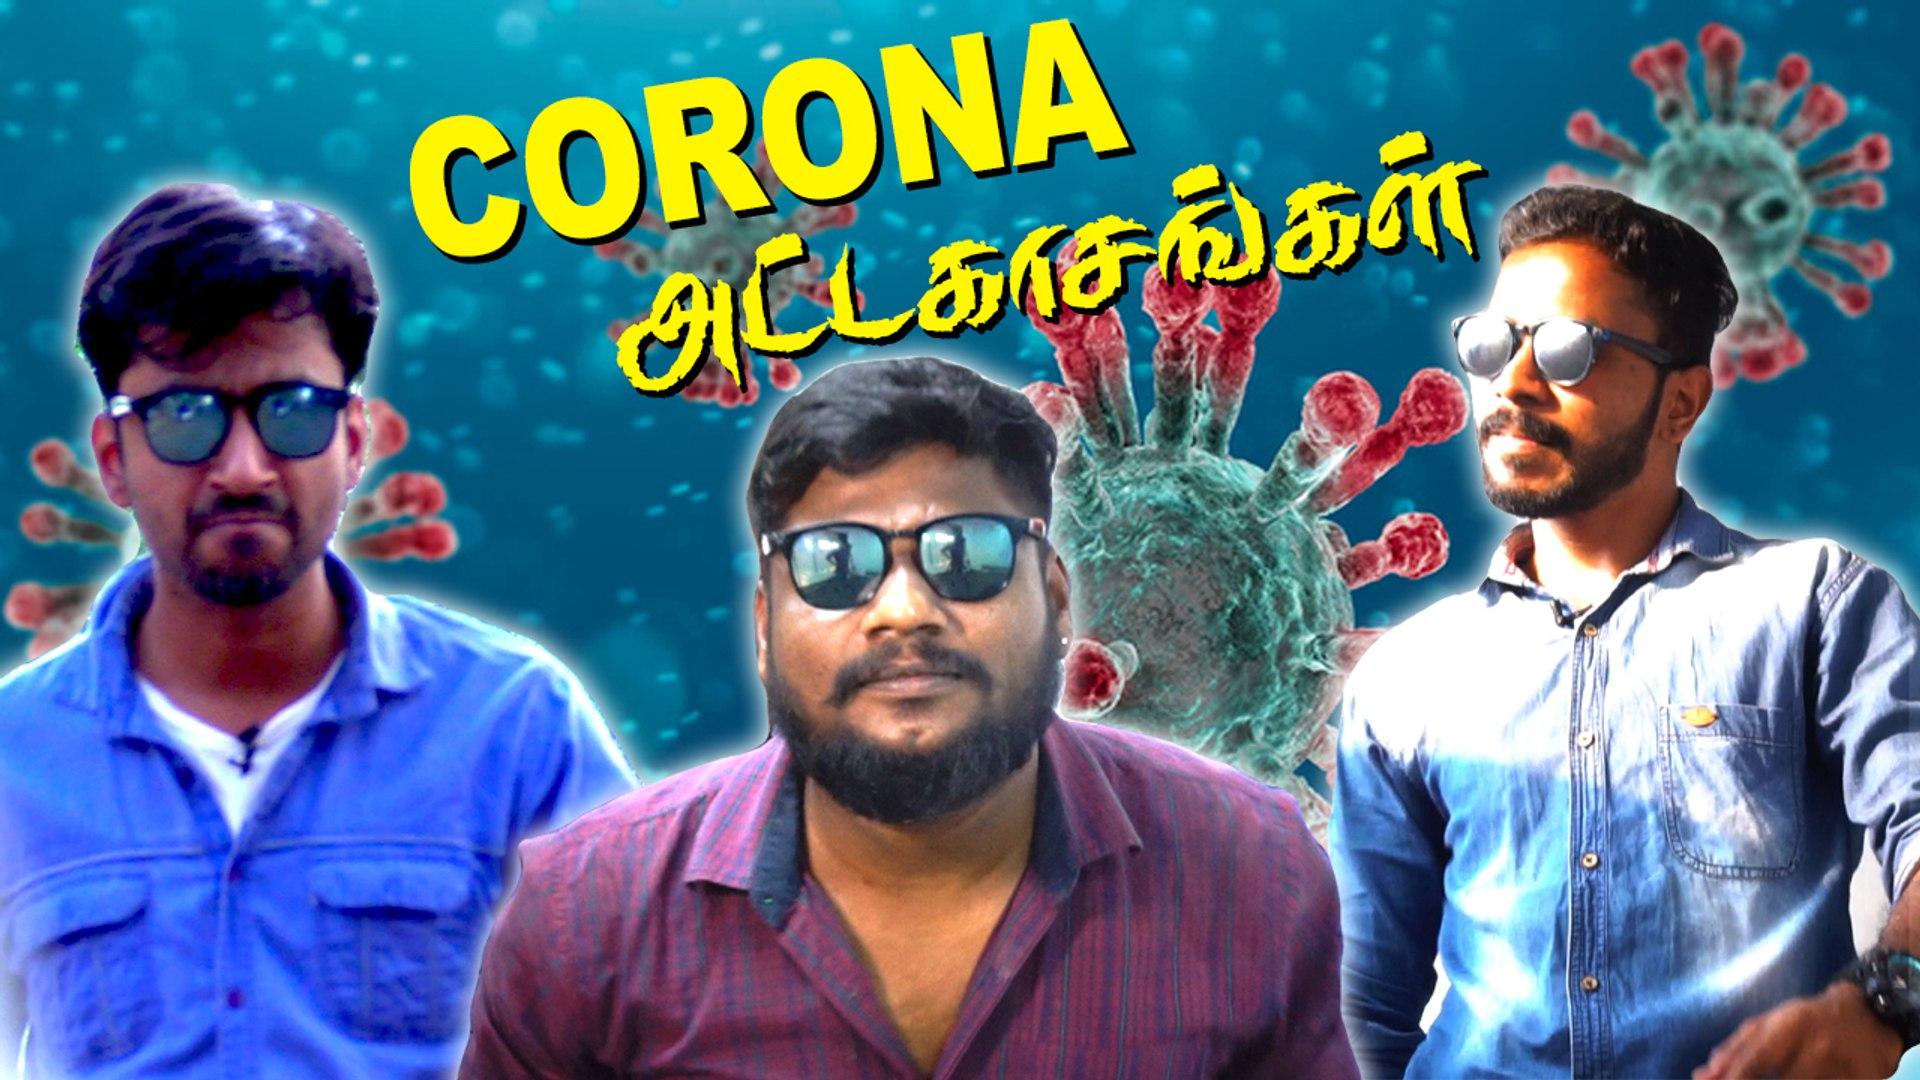 Corona Virus Awareness | Coronavirus Myths vs Facts